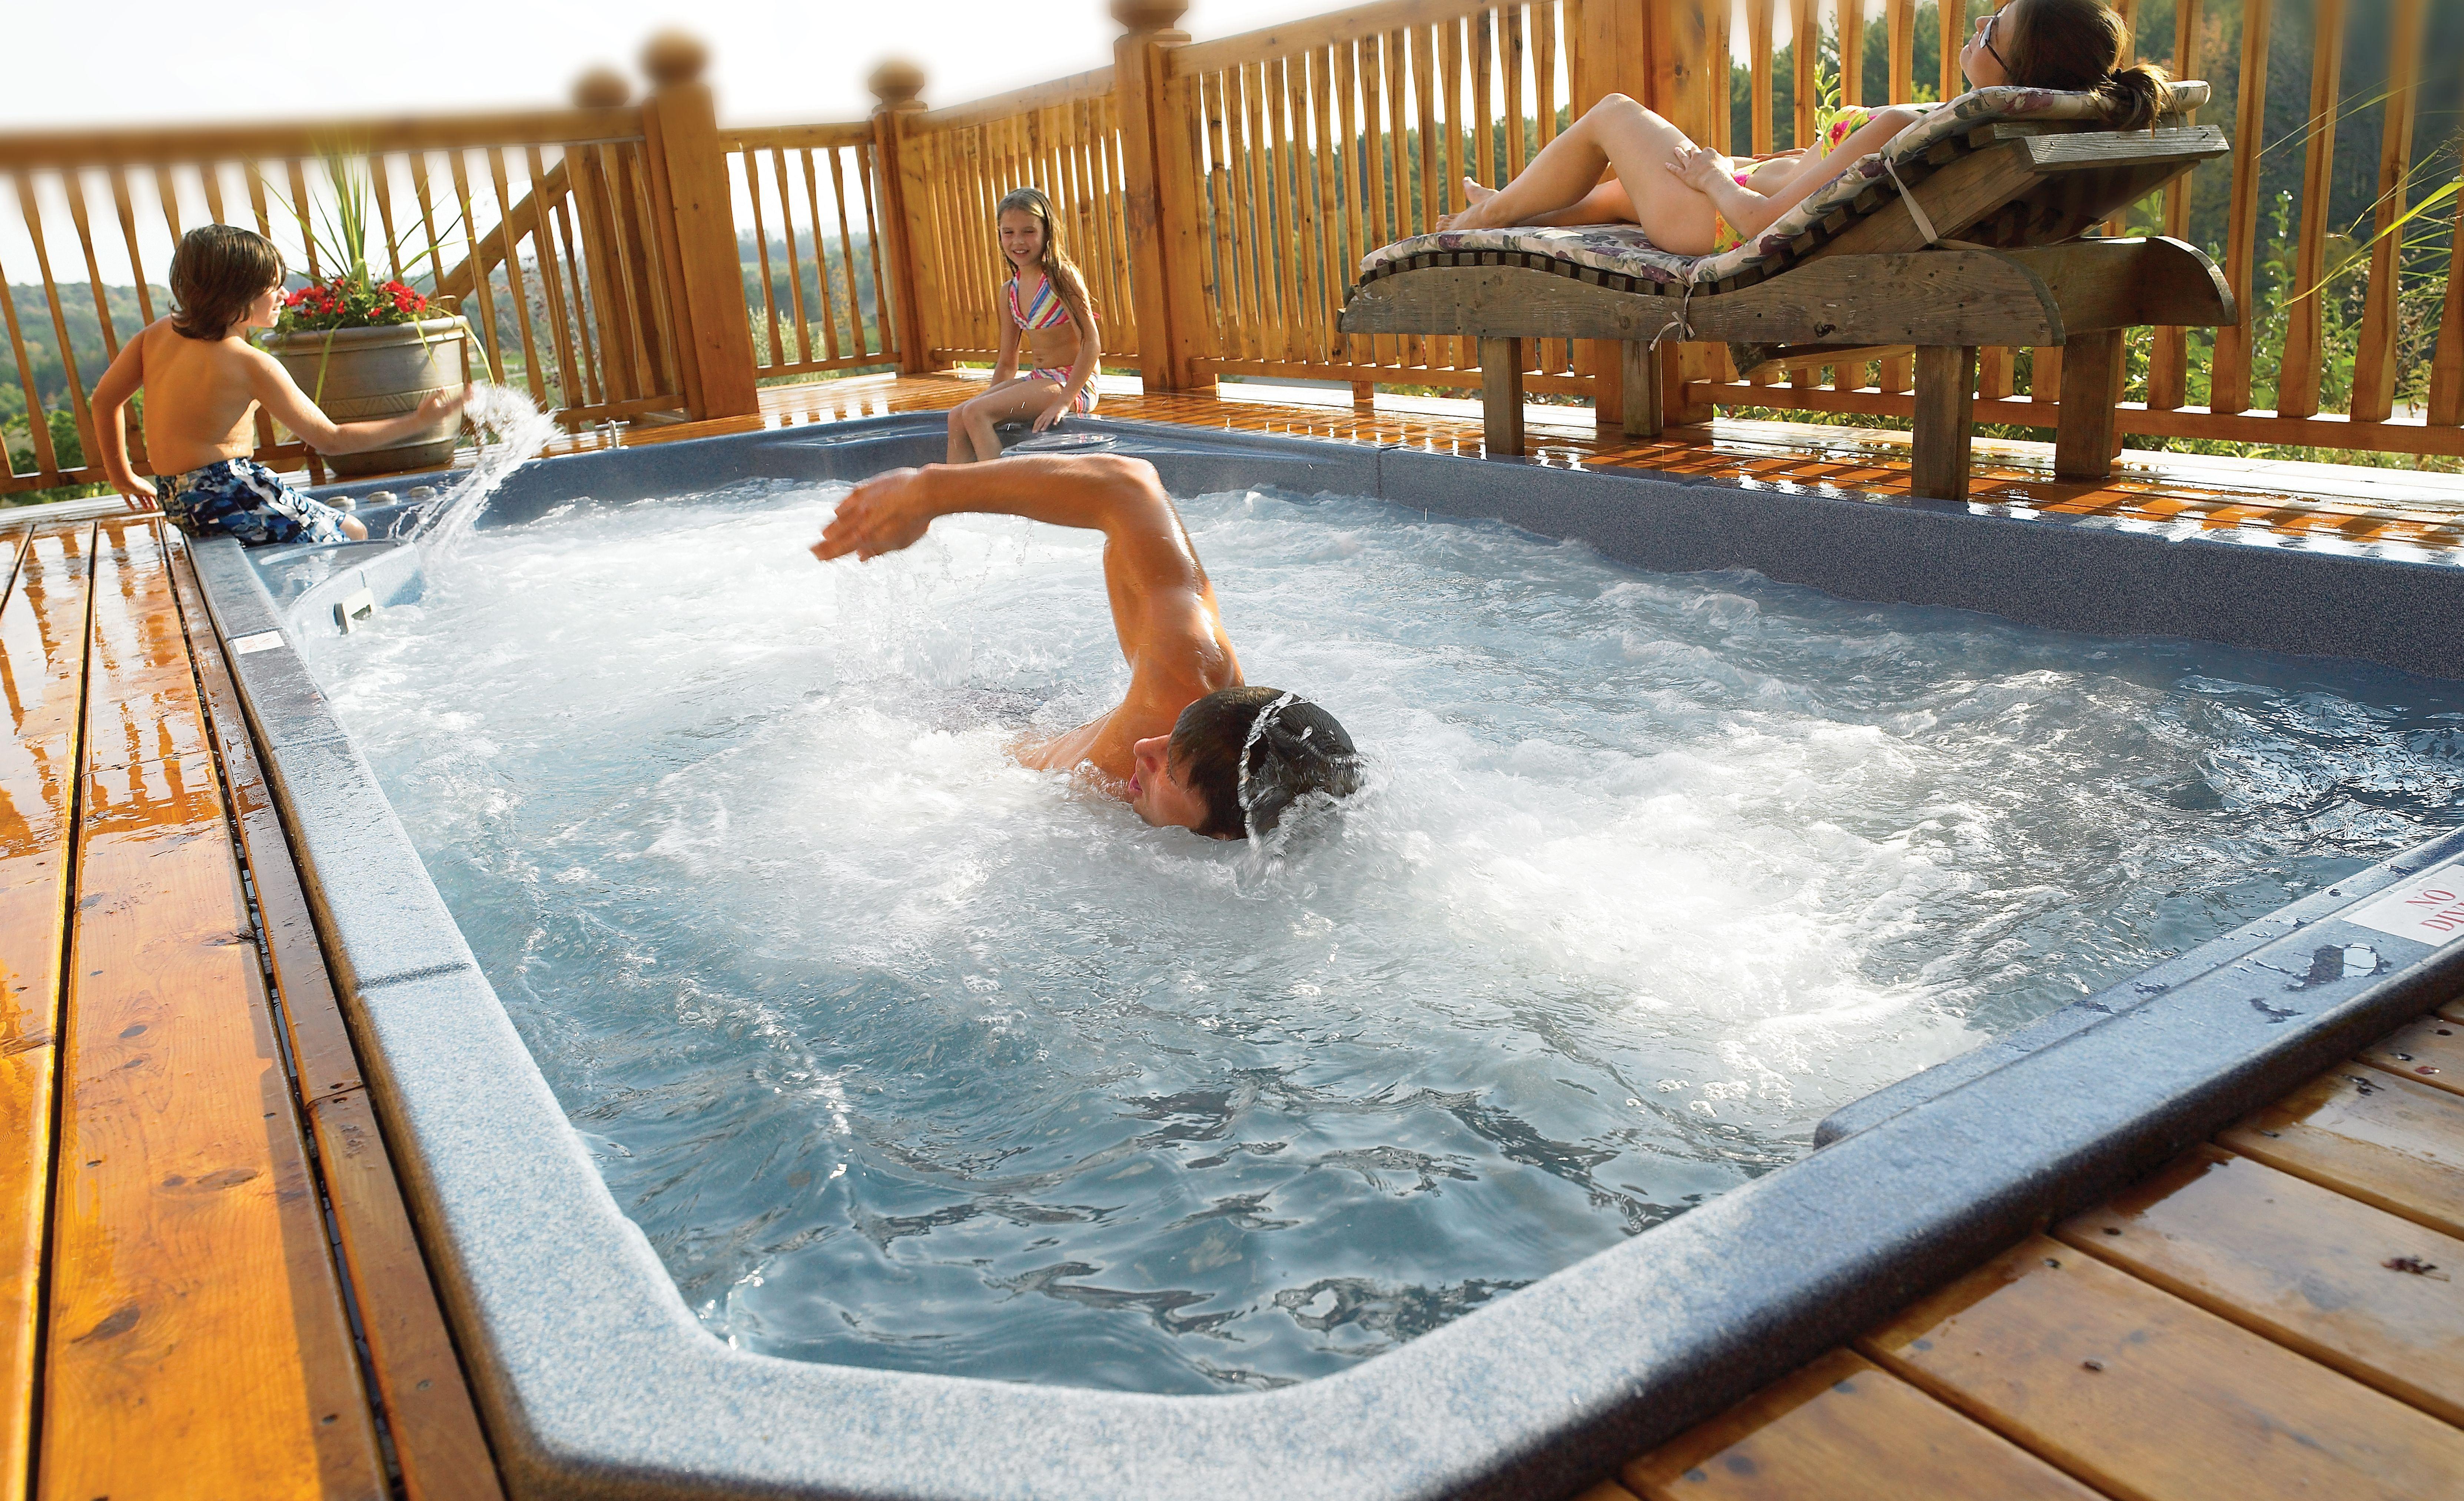 hydropool17fx aquatrainer ellenáramoltatós medence13